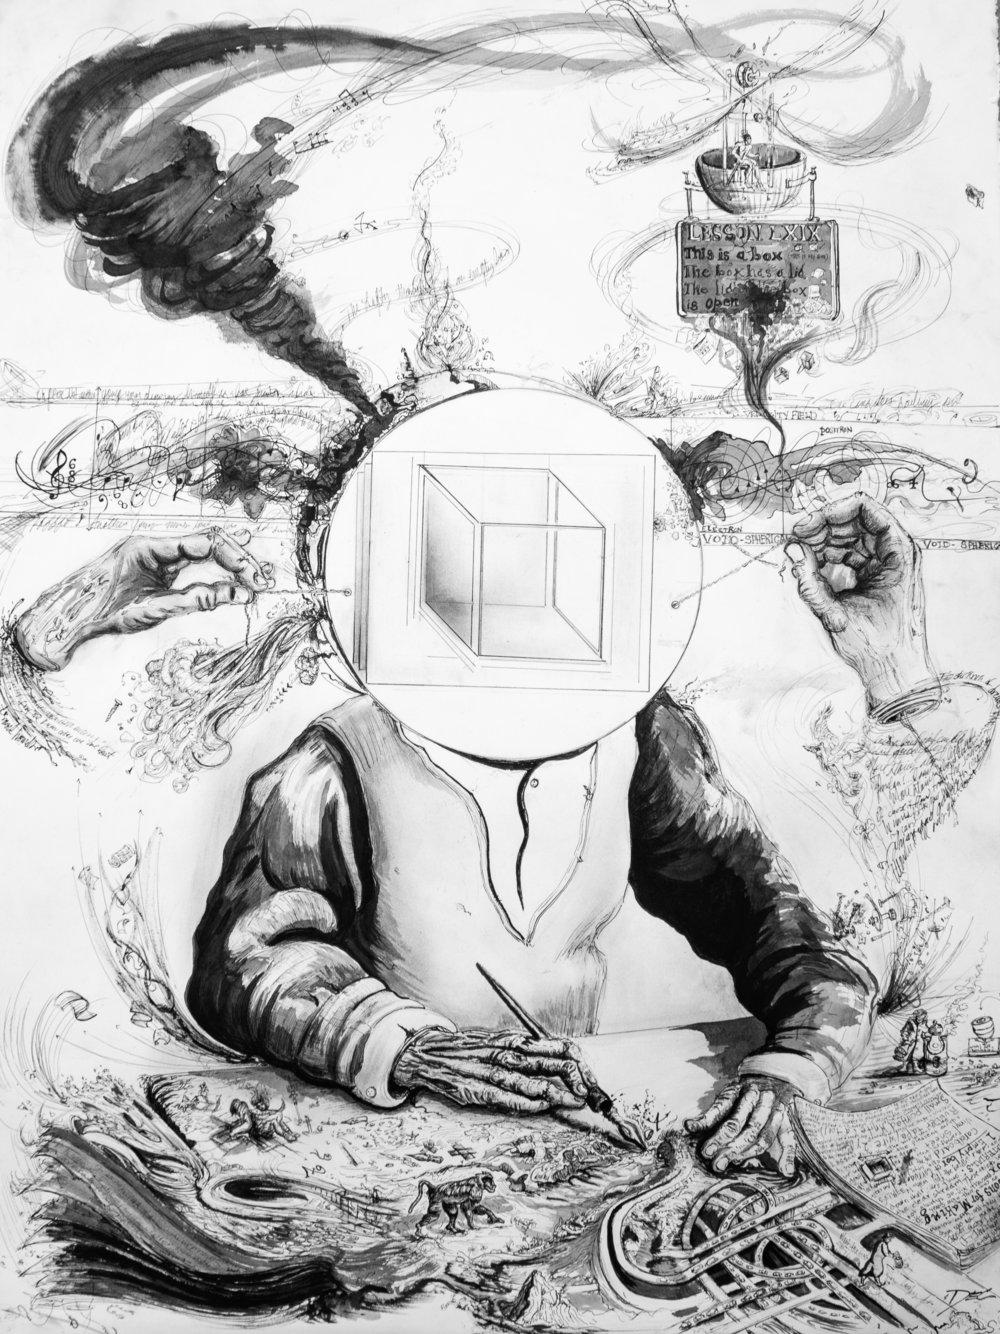 Lesson Lxix: Last Ballad of the Box Man